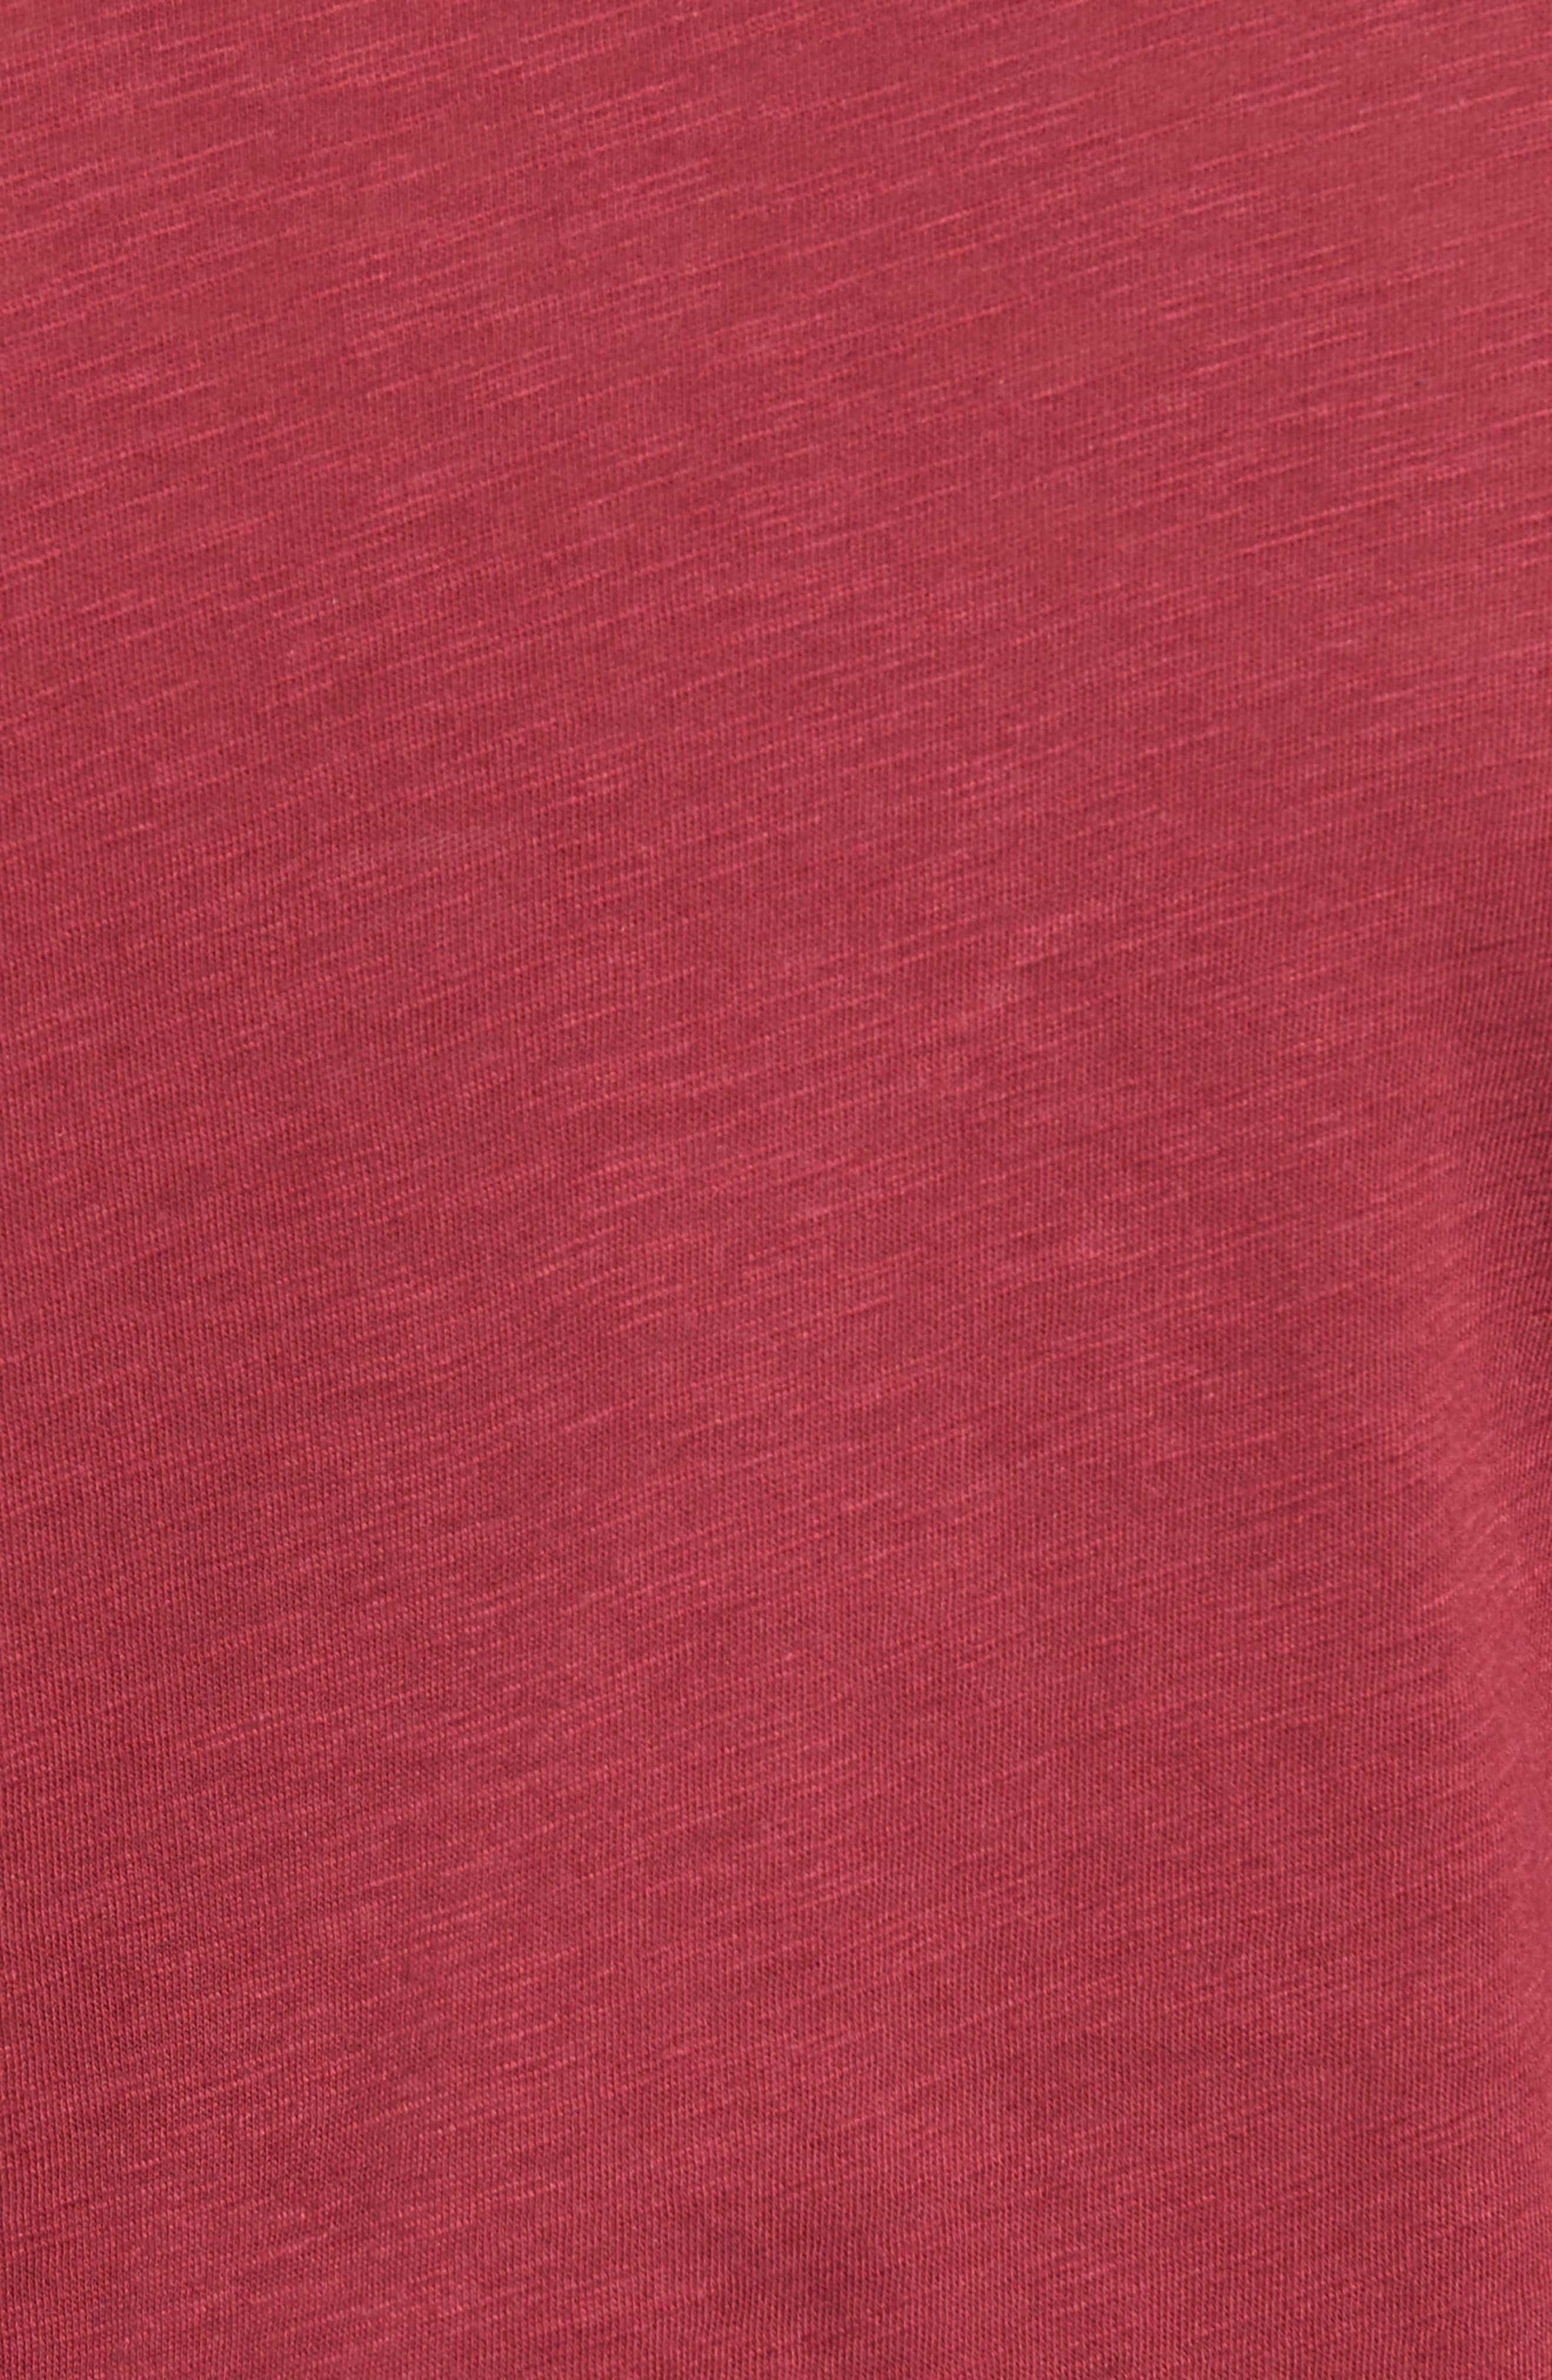 Katrina Cold Shoulder Tee,                             Alternate thumbnail 4, color,                             Rhododendron